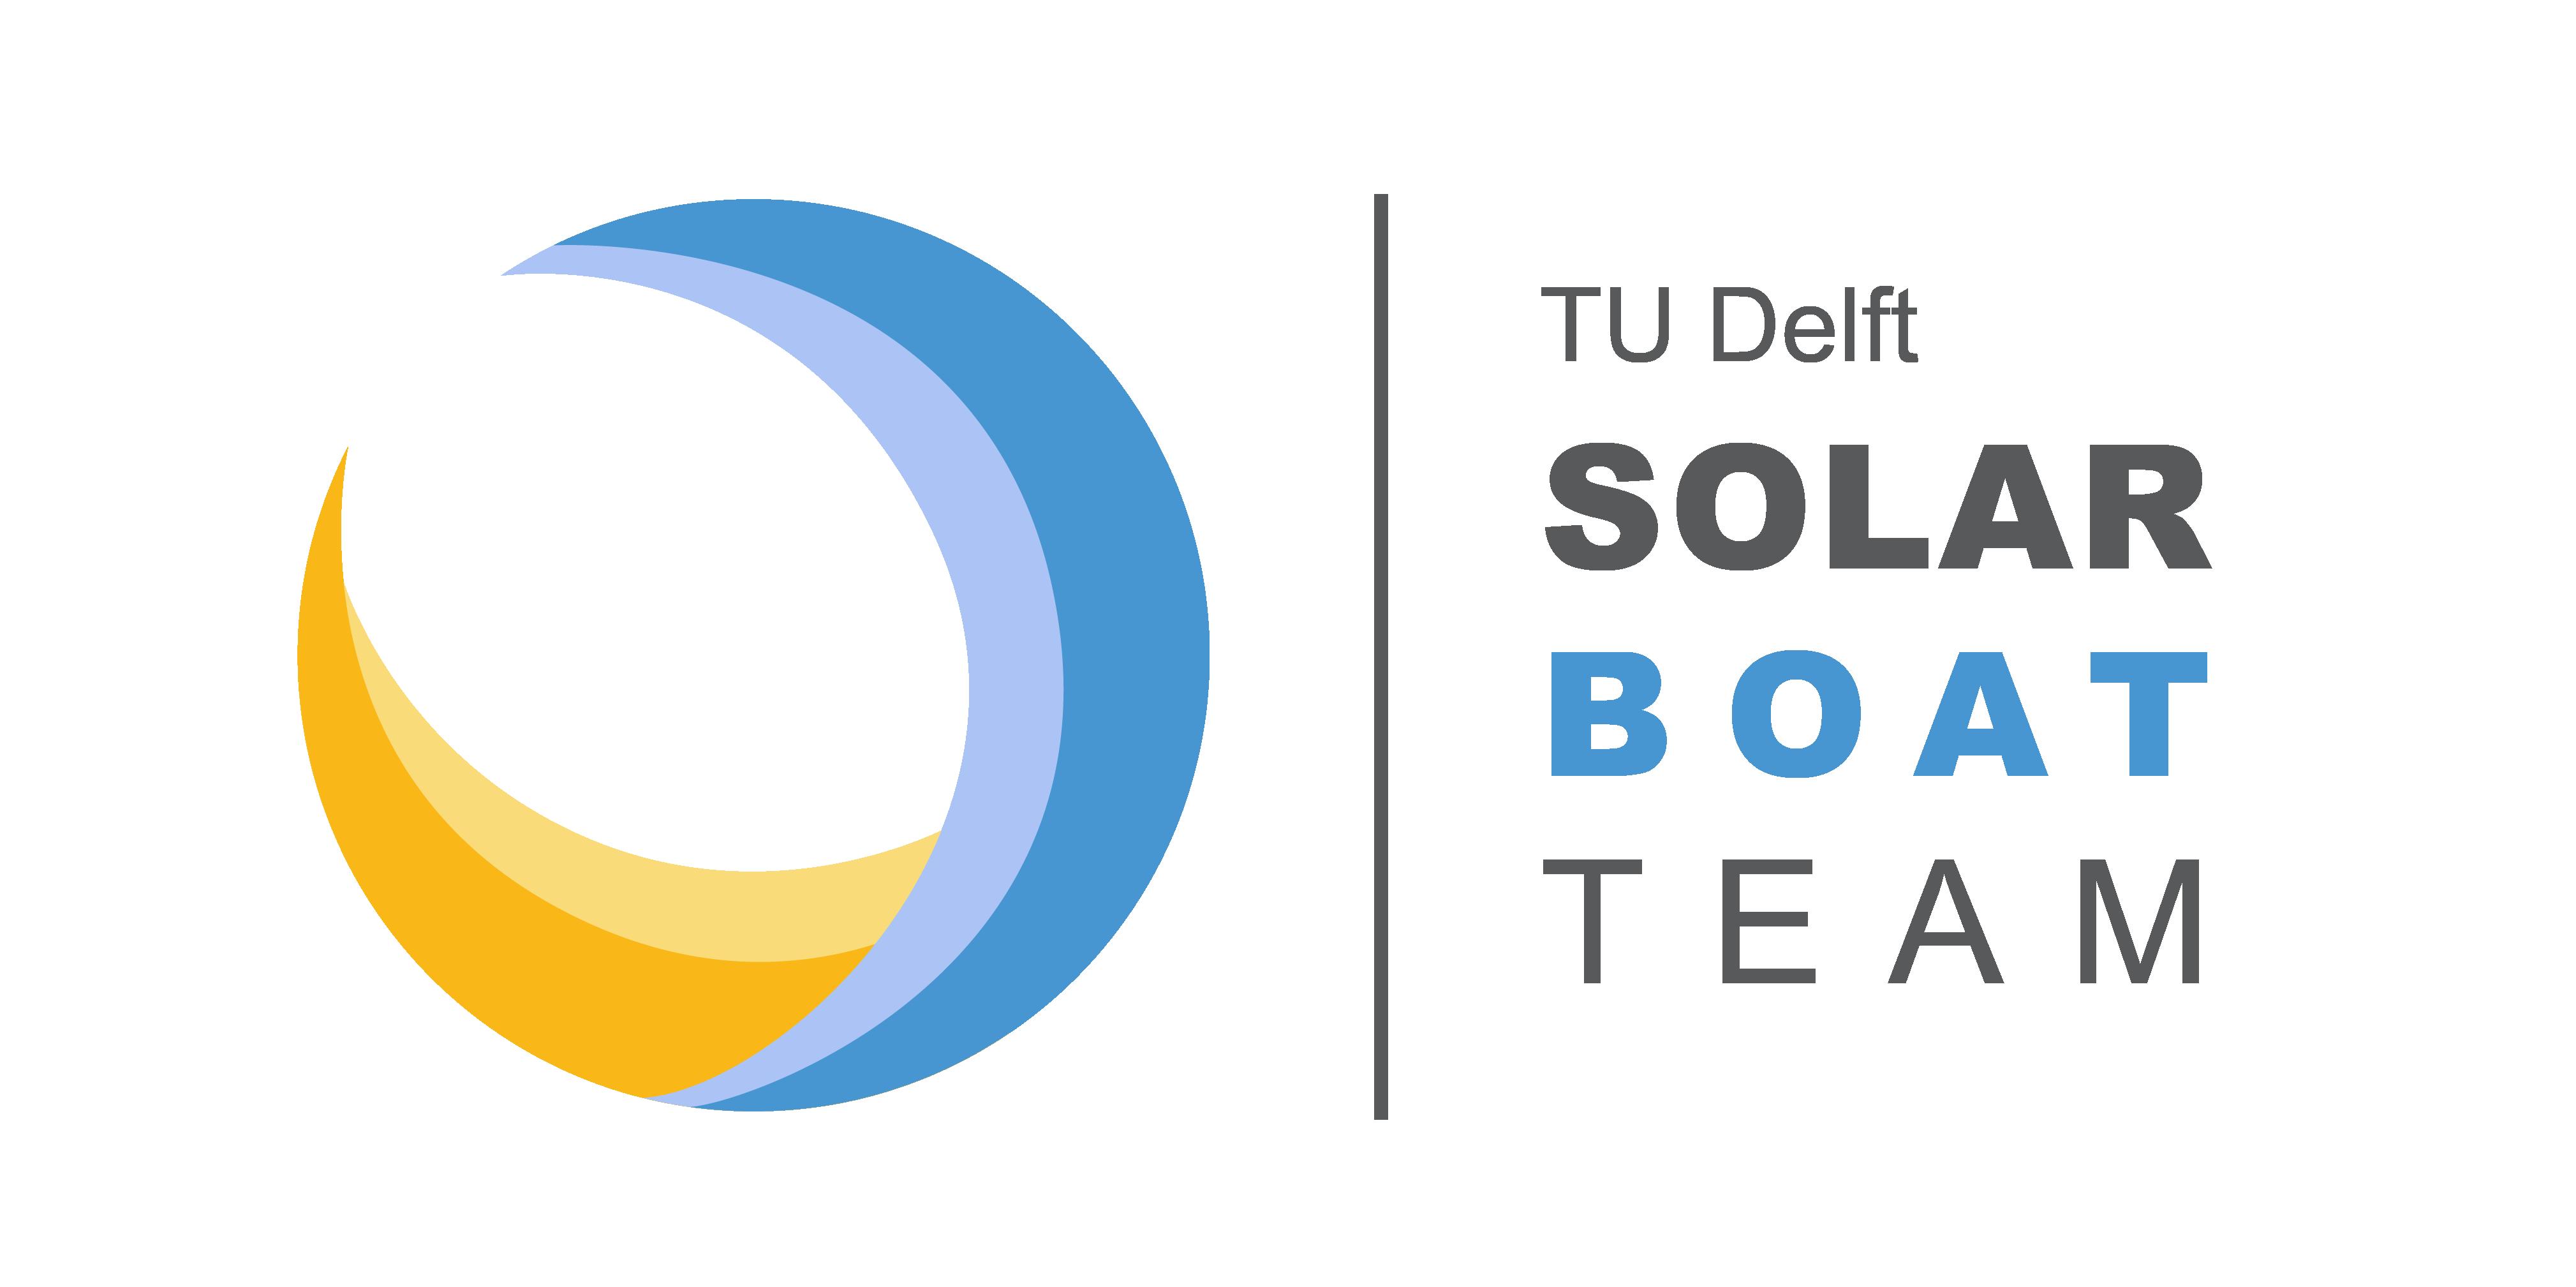 TU Delft Solar Boat Team